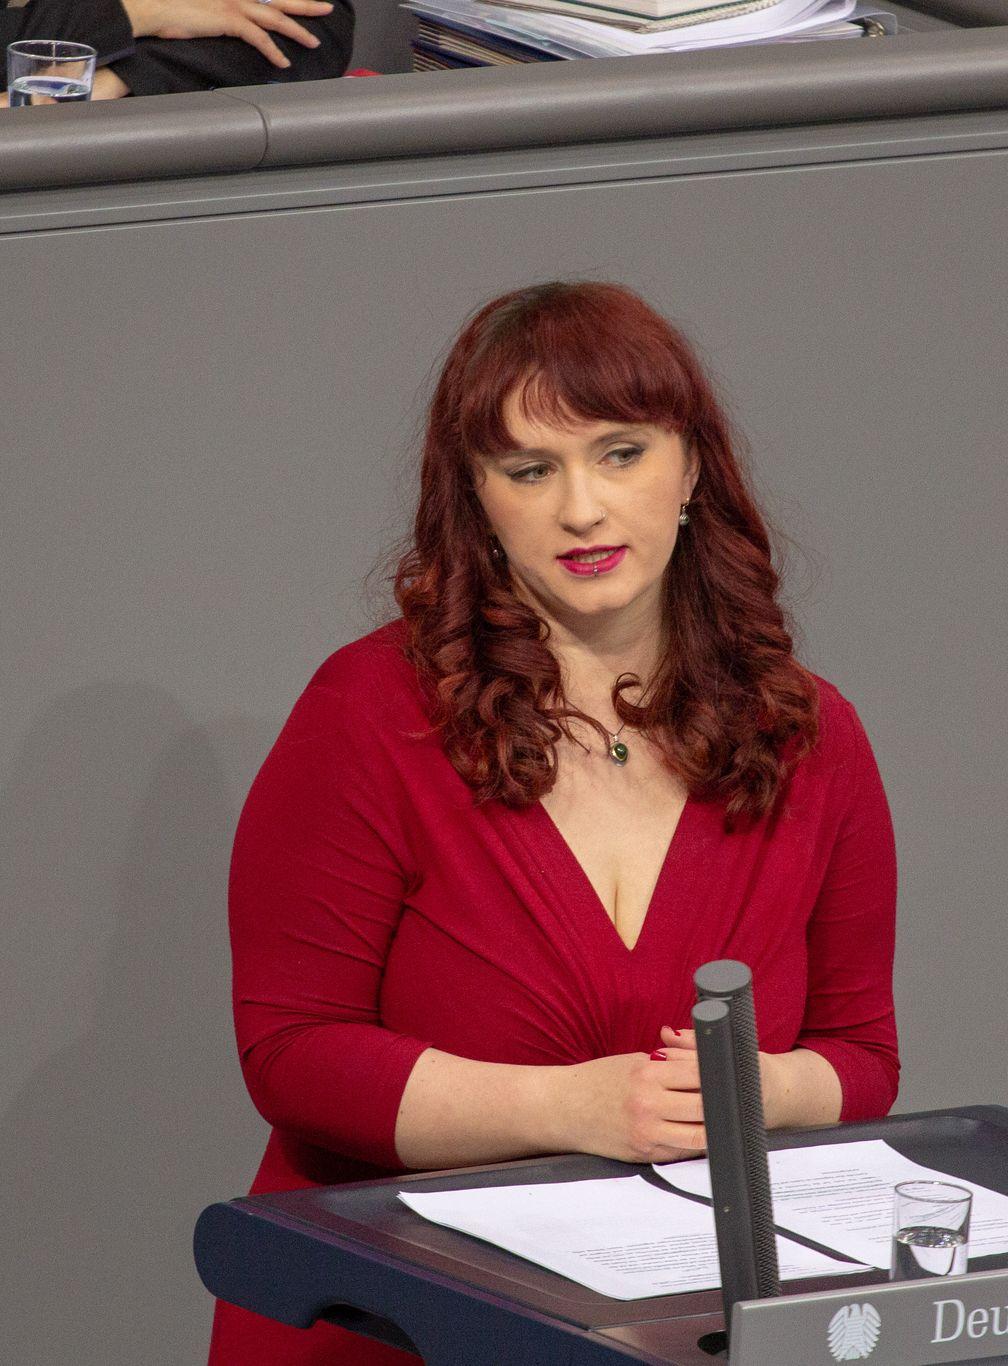 Agnieszka Brugger, 2019